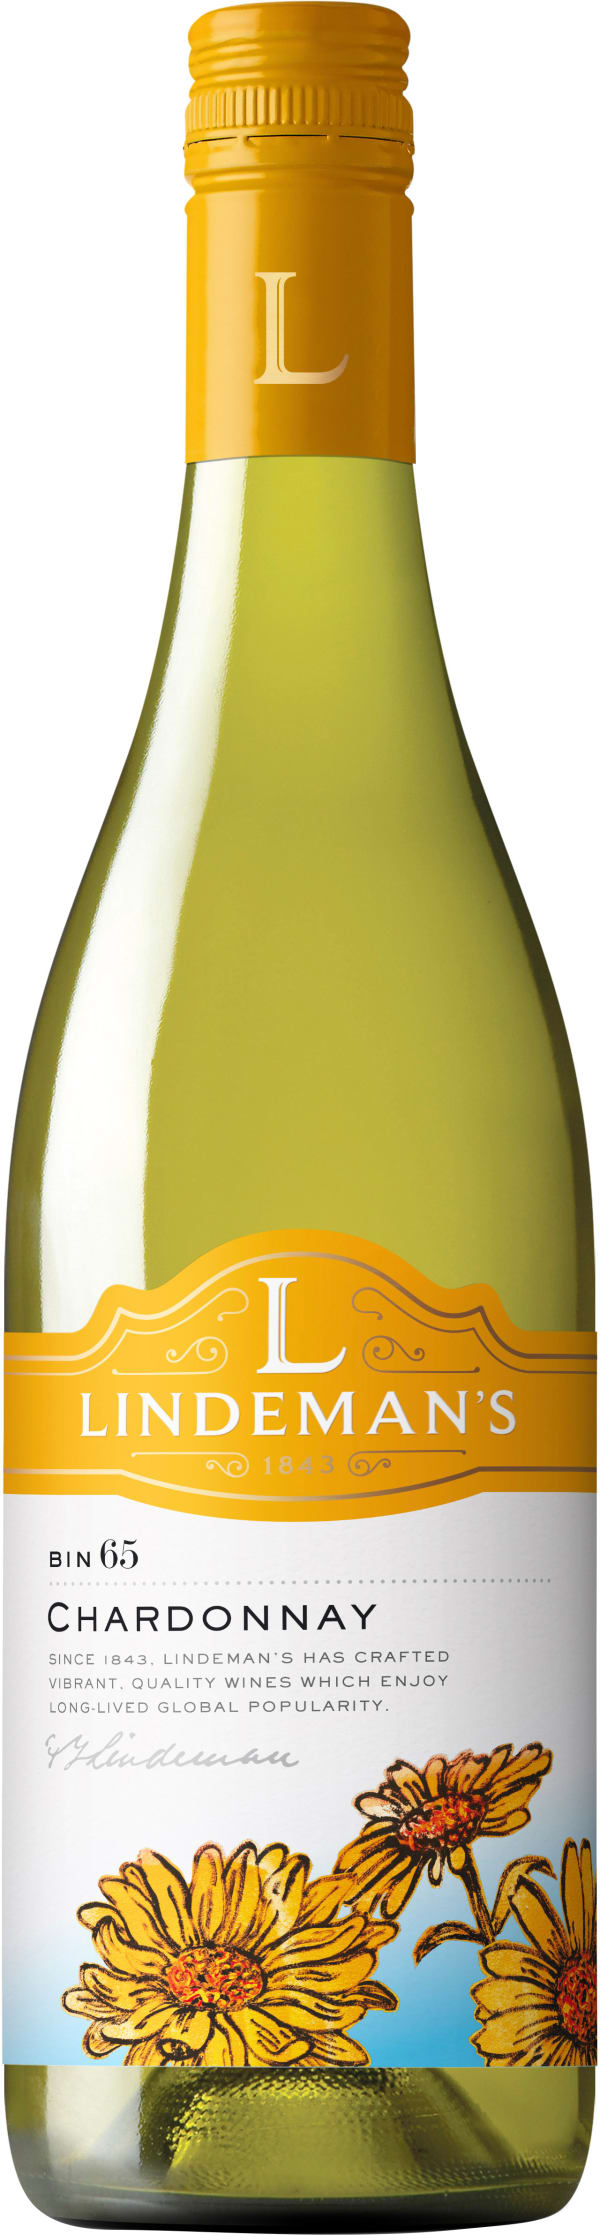 Lindemans Bin 65 Chardonnay 2018